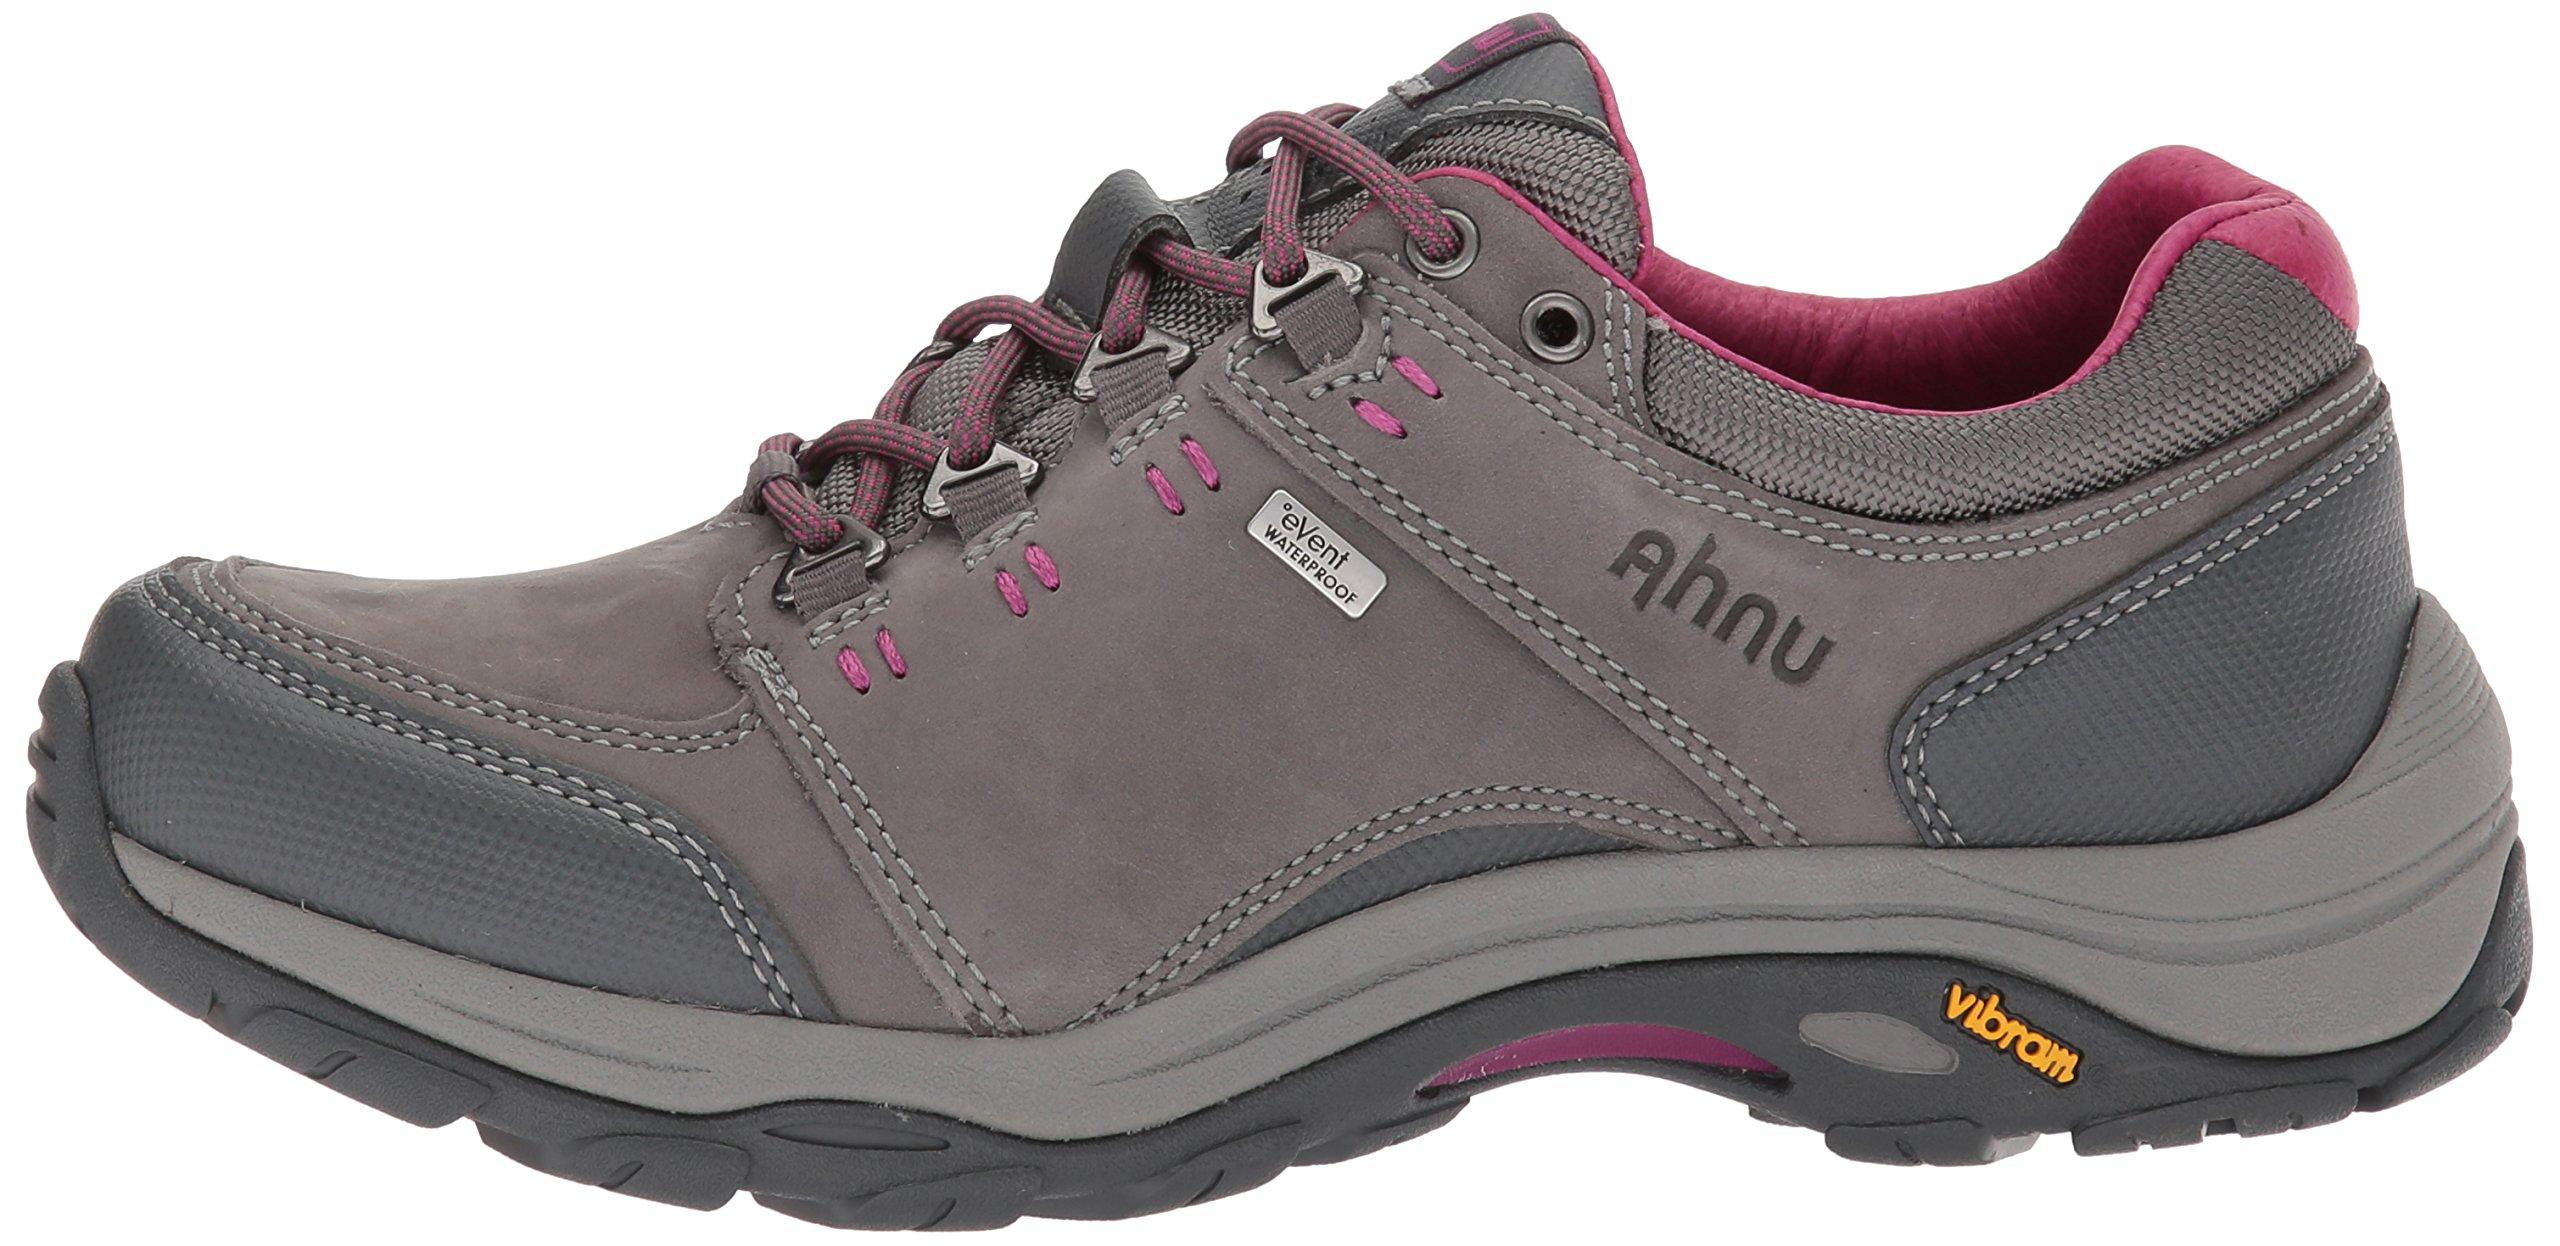 Ahnu Women's W Montara III Event Hiking Boot, Charcoal, 6 Medium US by Ahnu (Image #5)